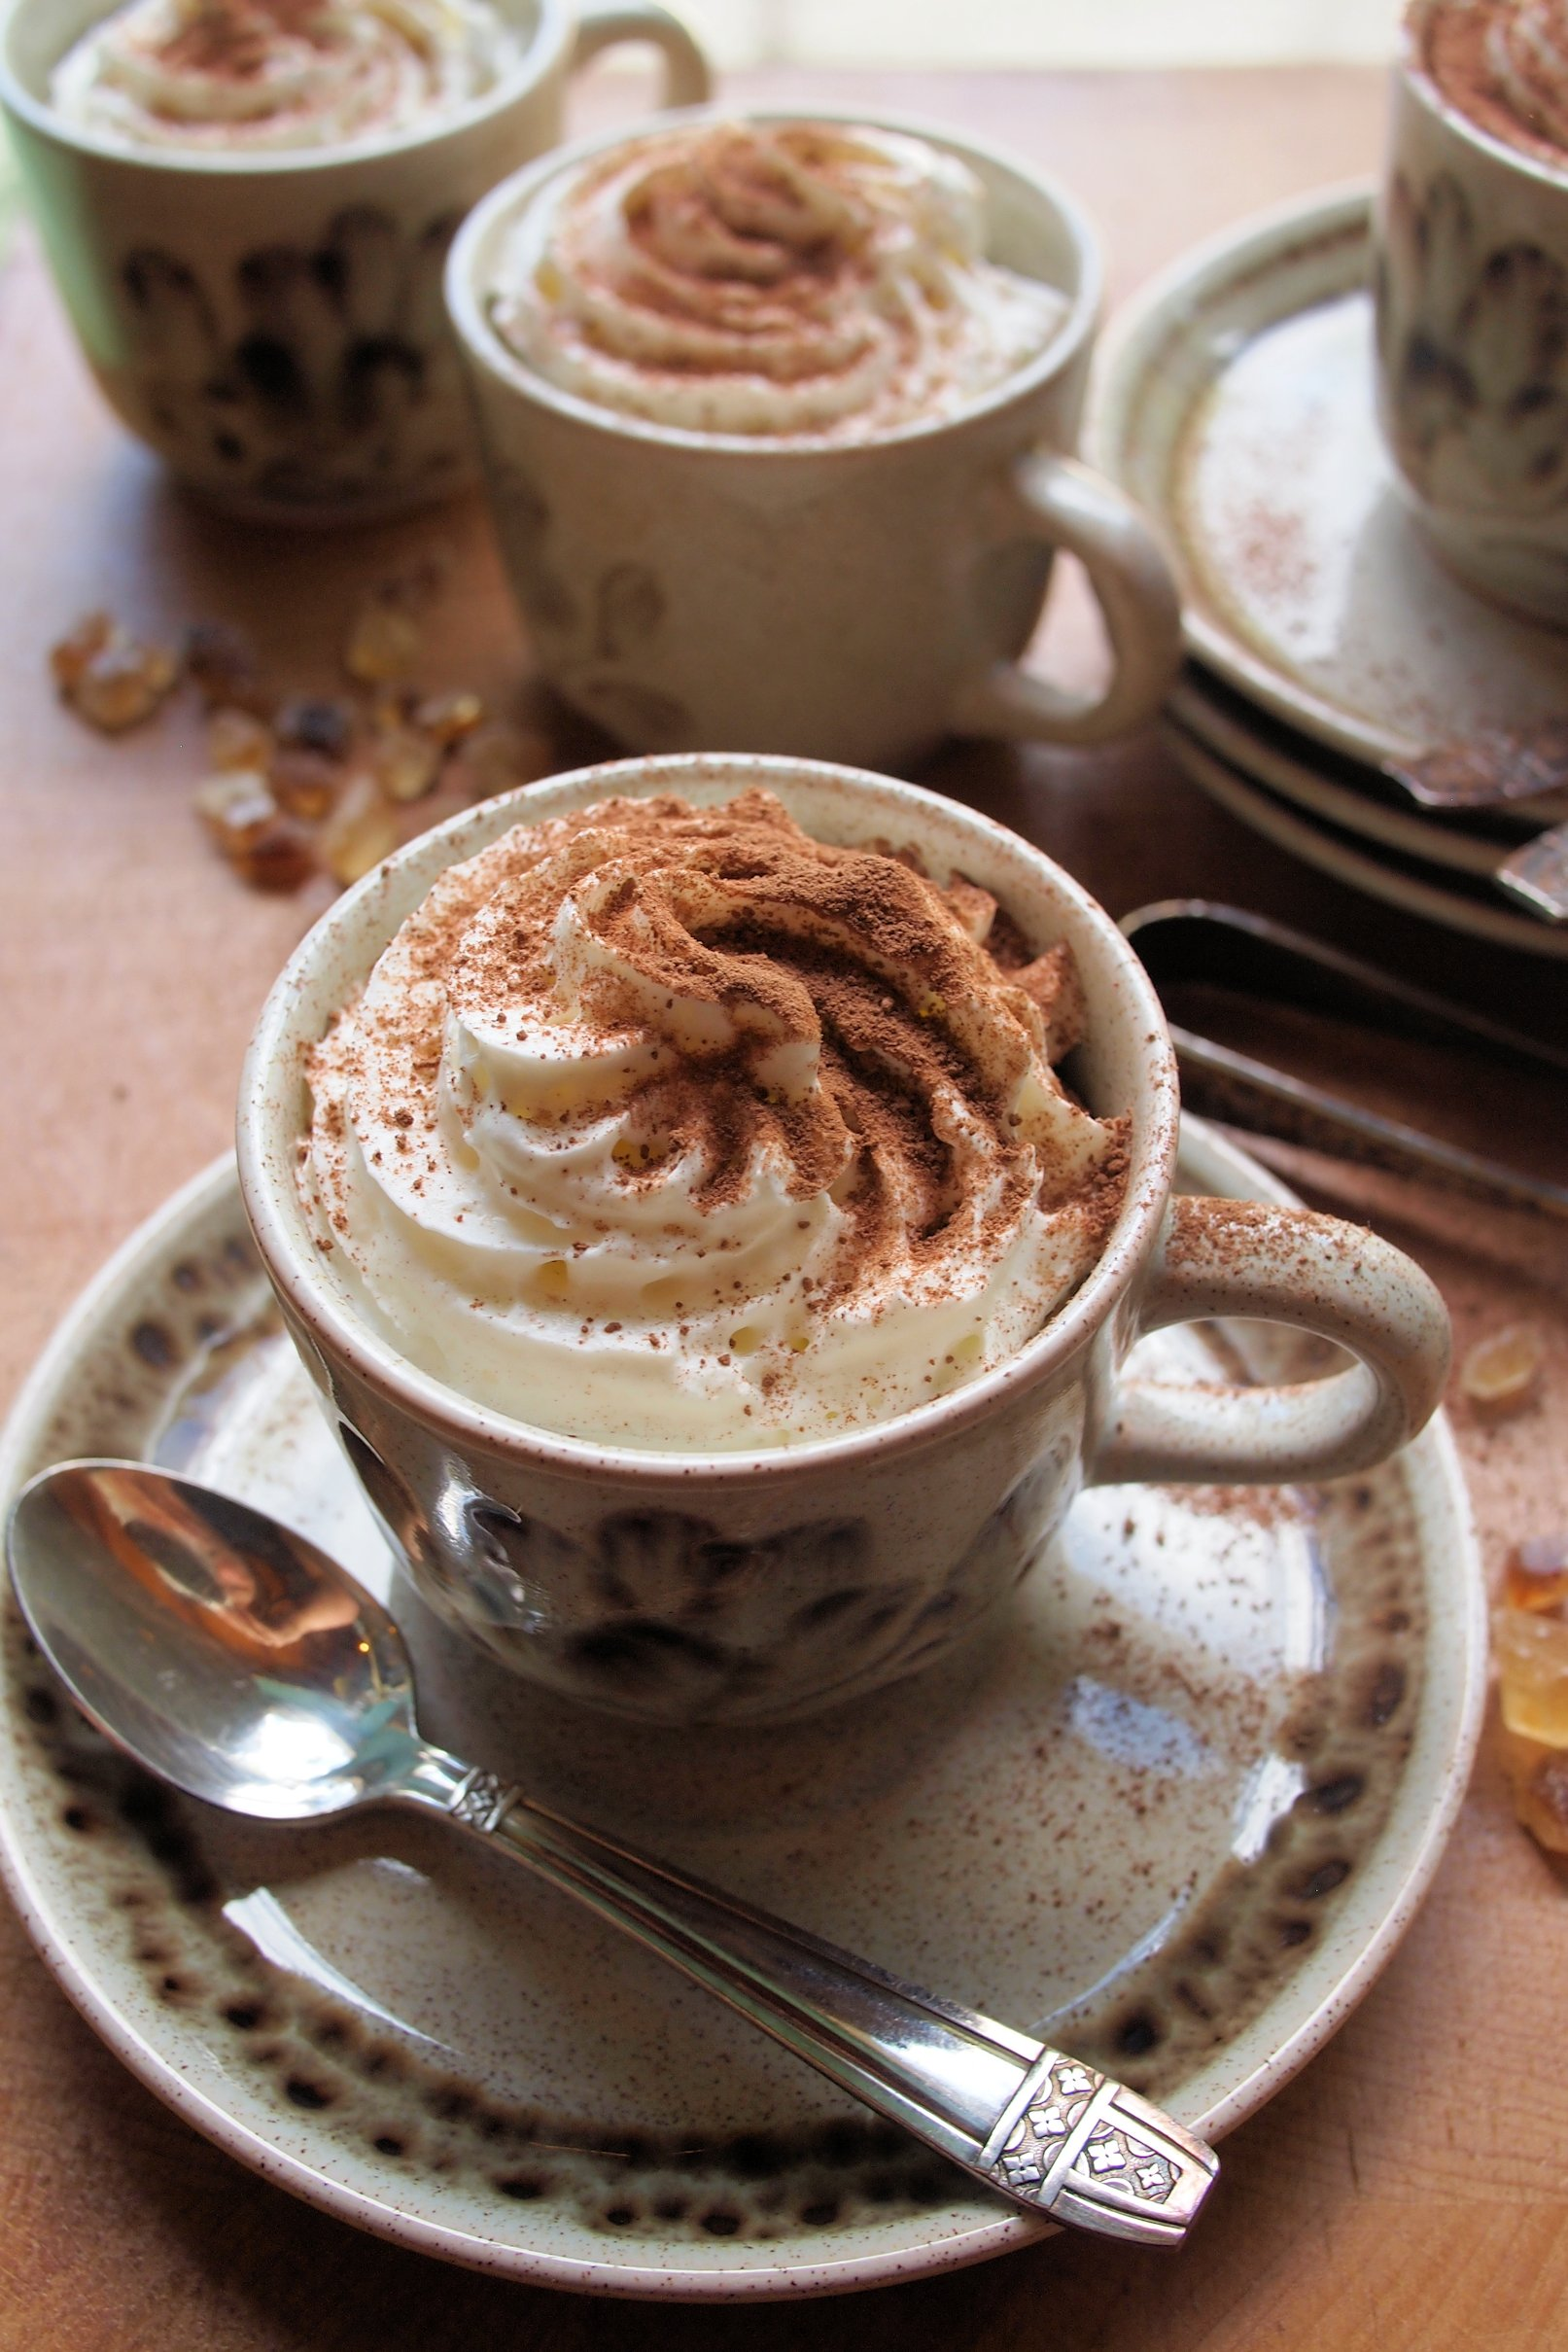 Coffee and Chocolate Cups